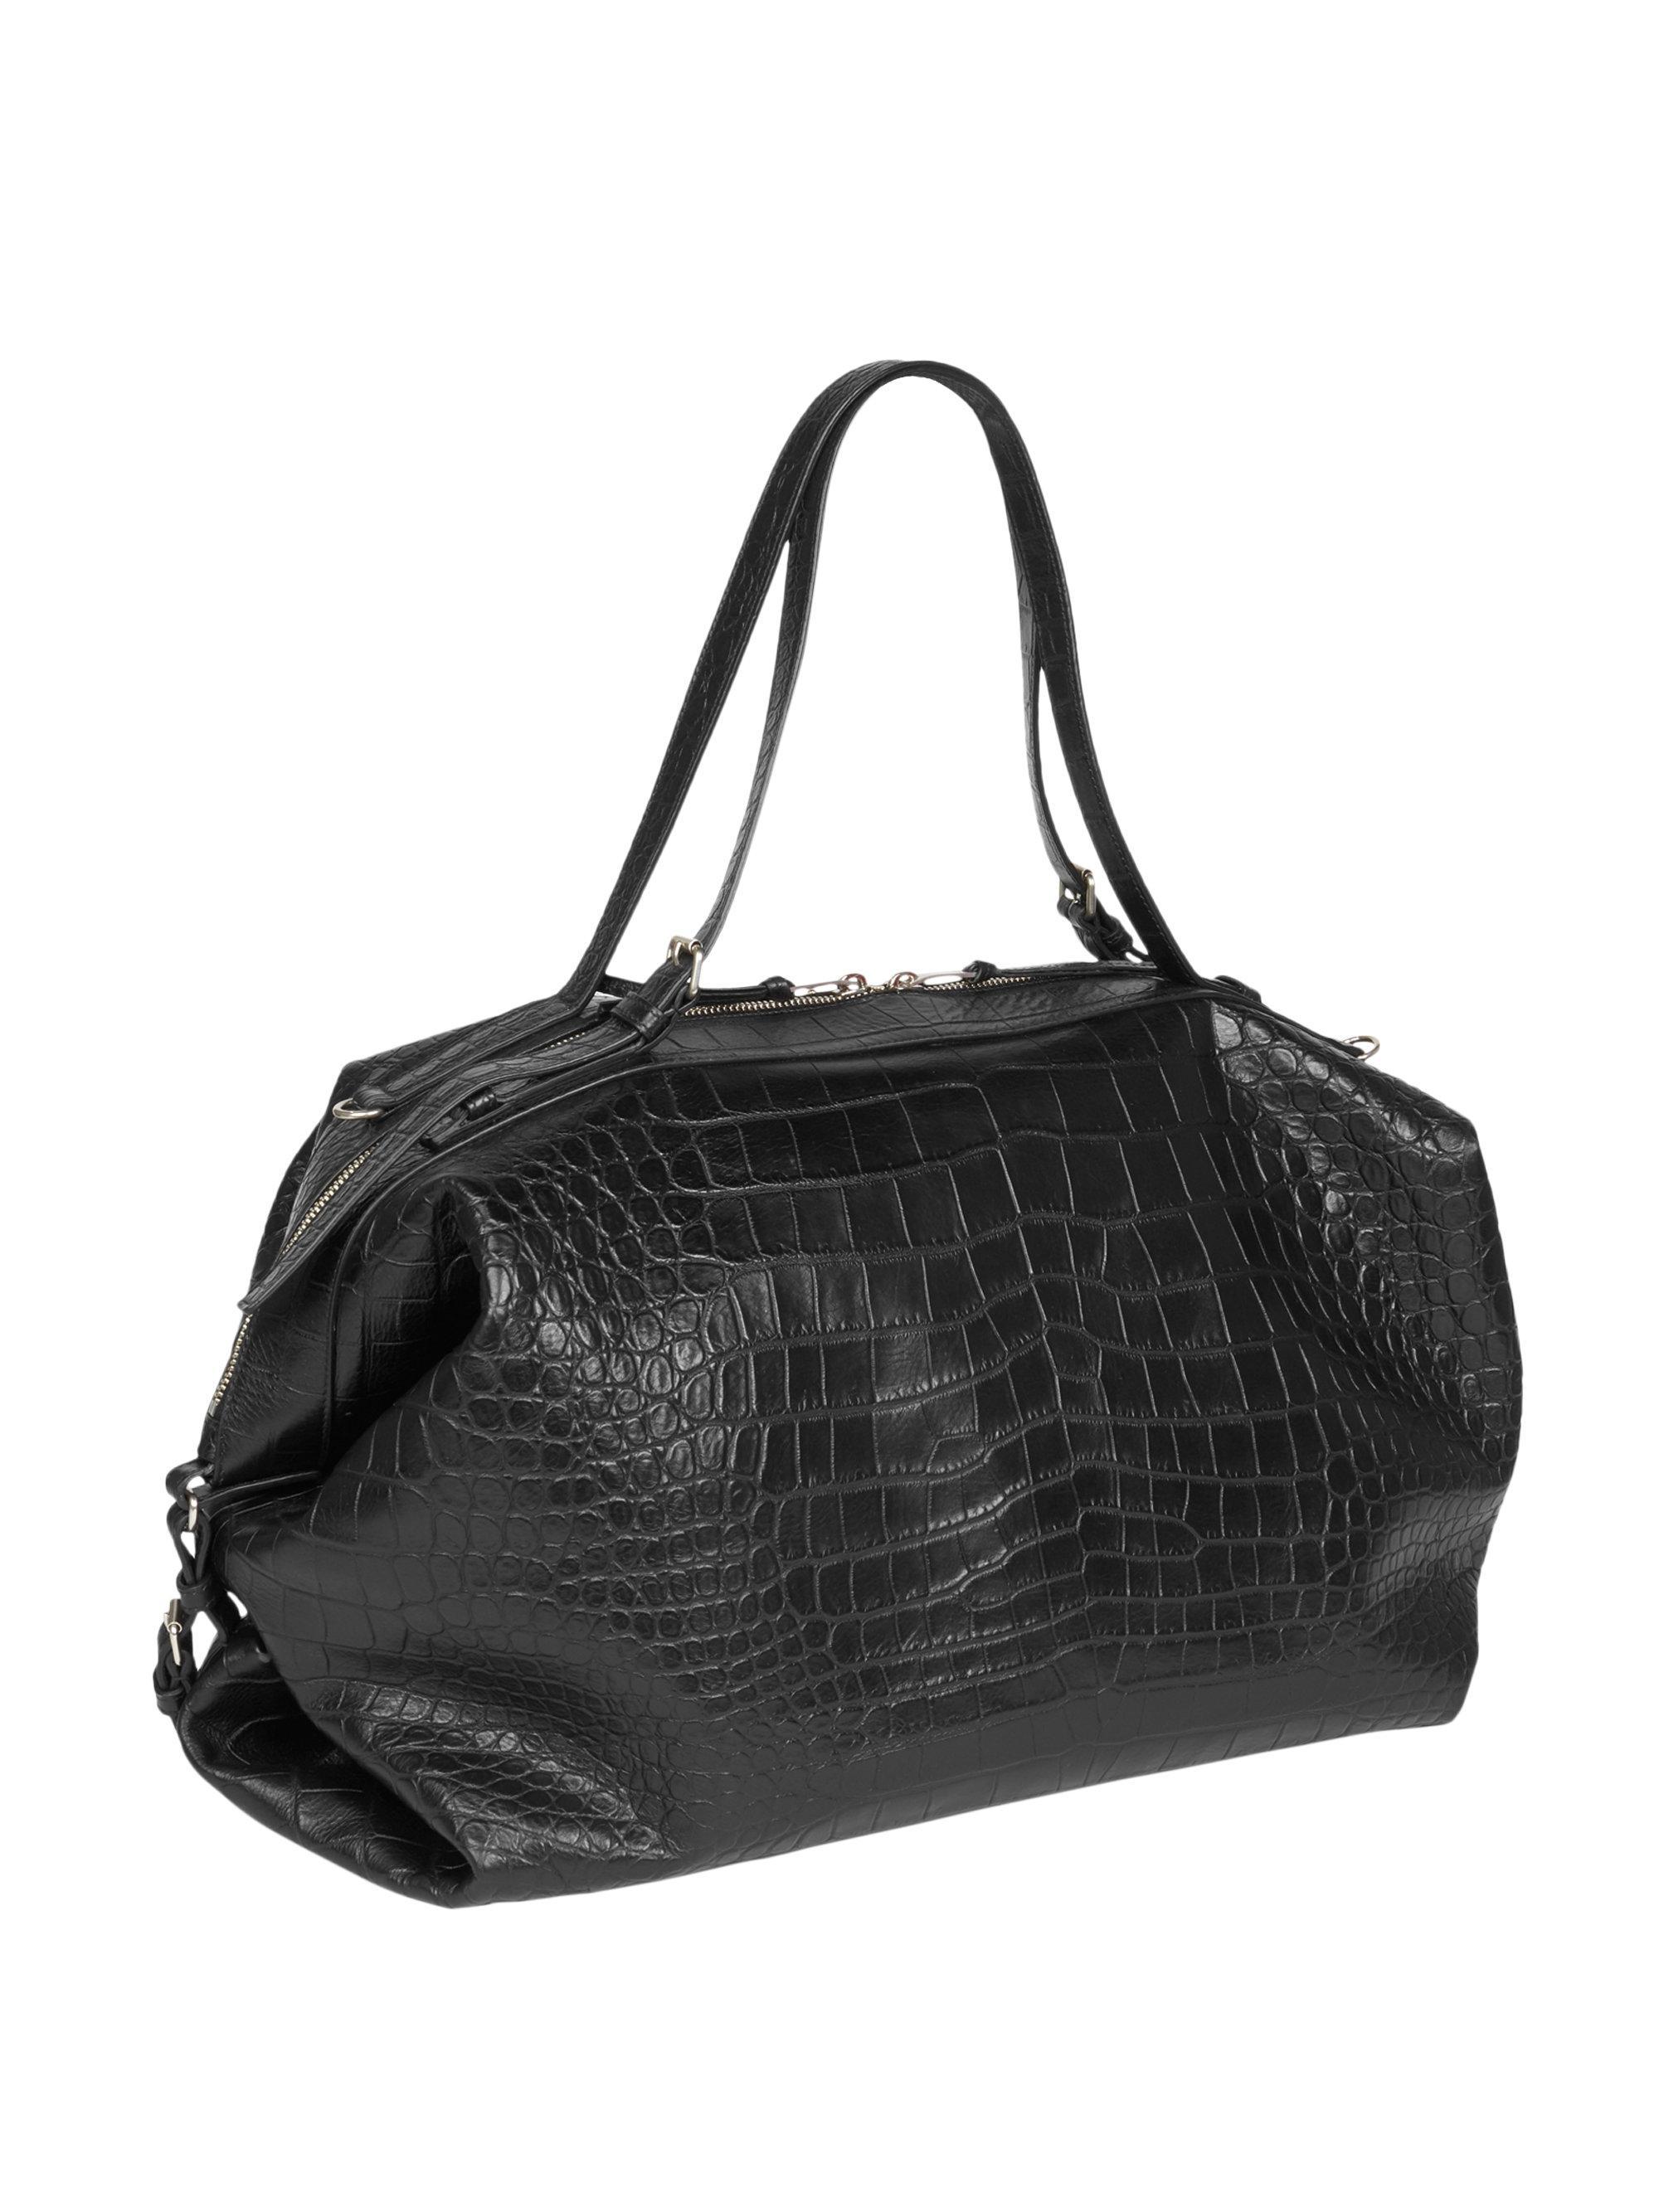 59b6b44754cd3 Saint Laurent Crocodile Embossed Leather Duffel Bag in Black for Men - Lyst